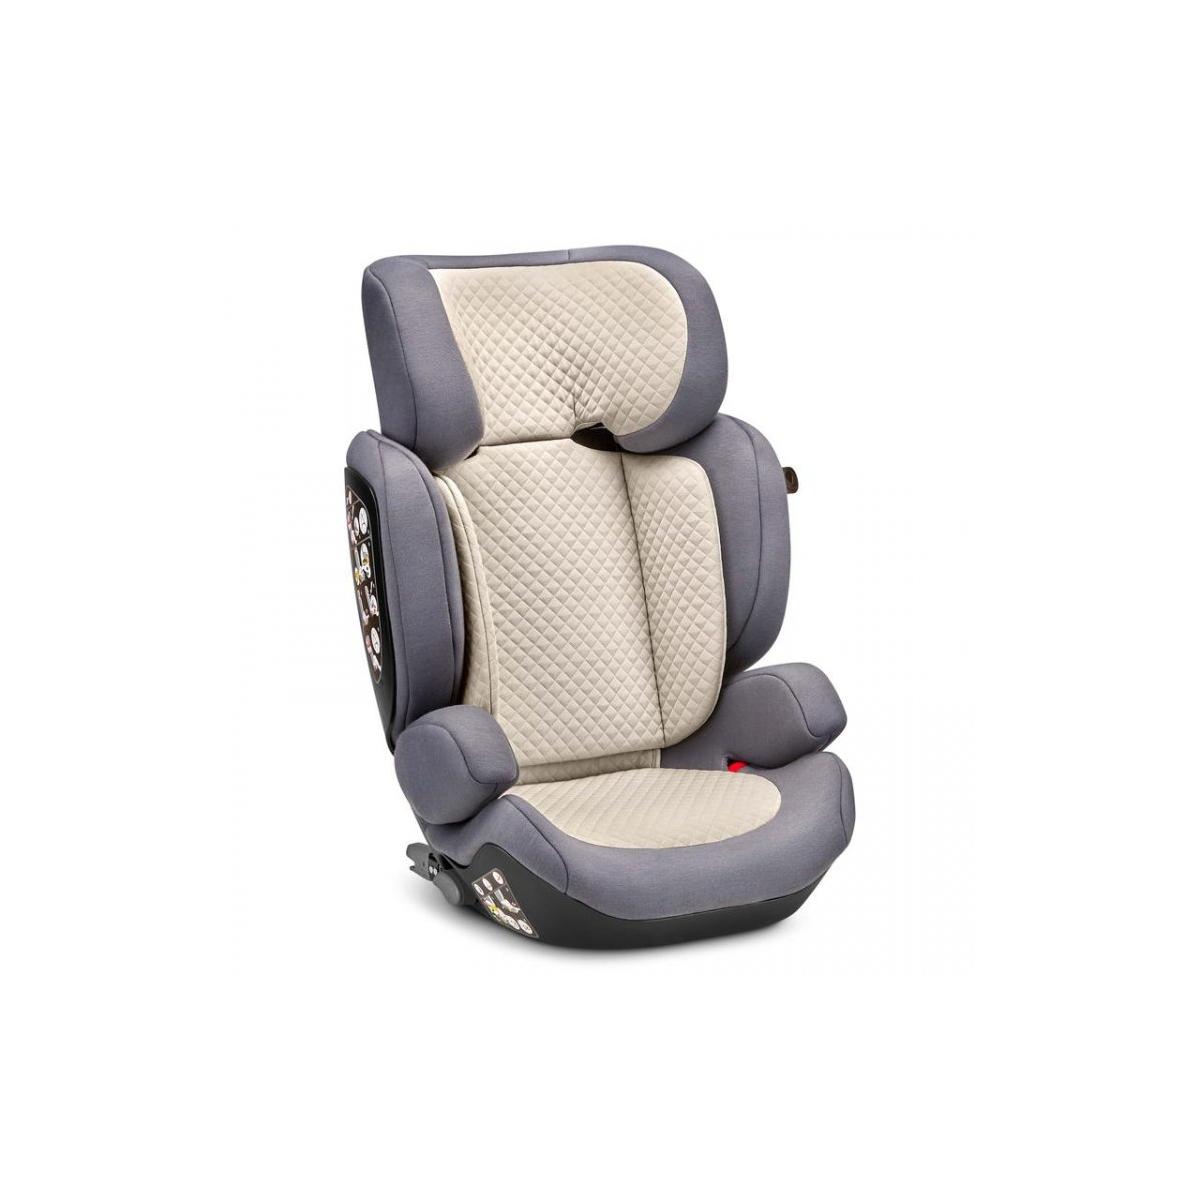 ABC Design Mallow Group 2/3 Isofix Car Seat-Stone (New 2020)